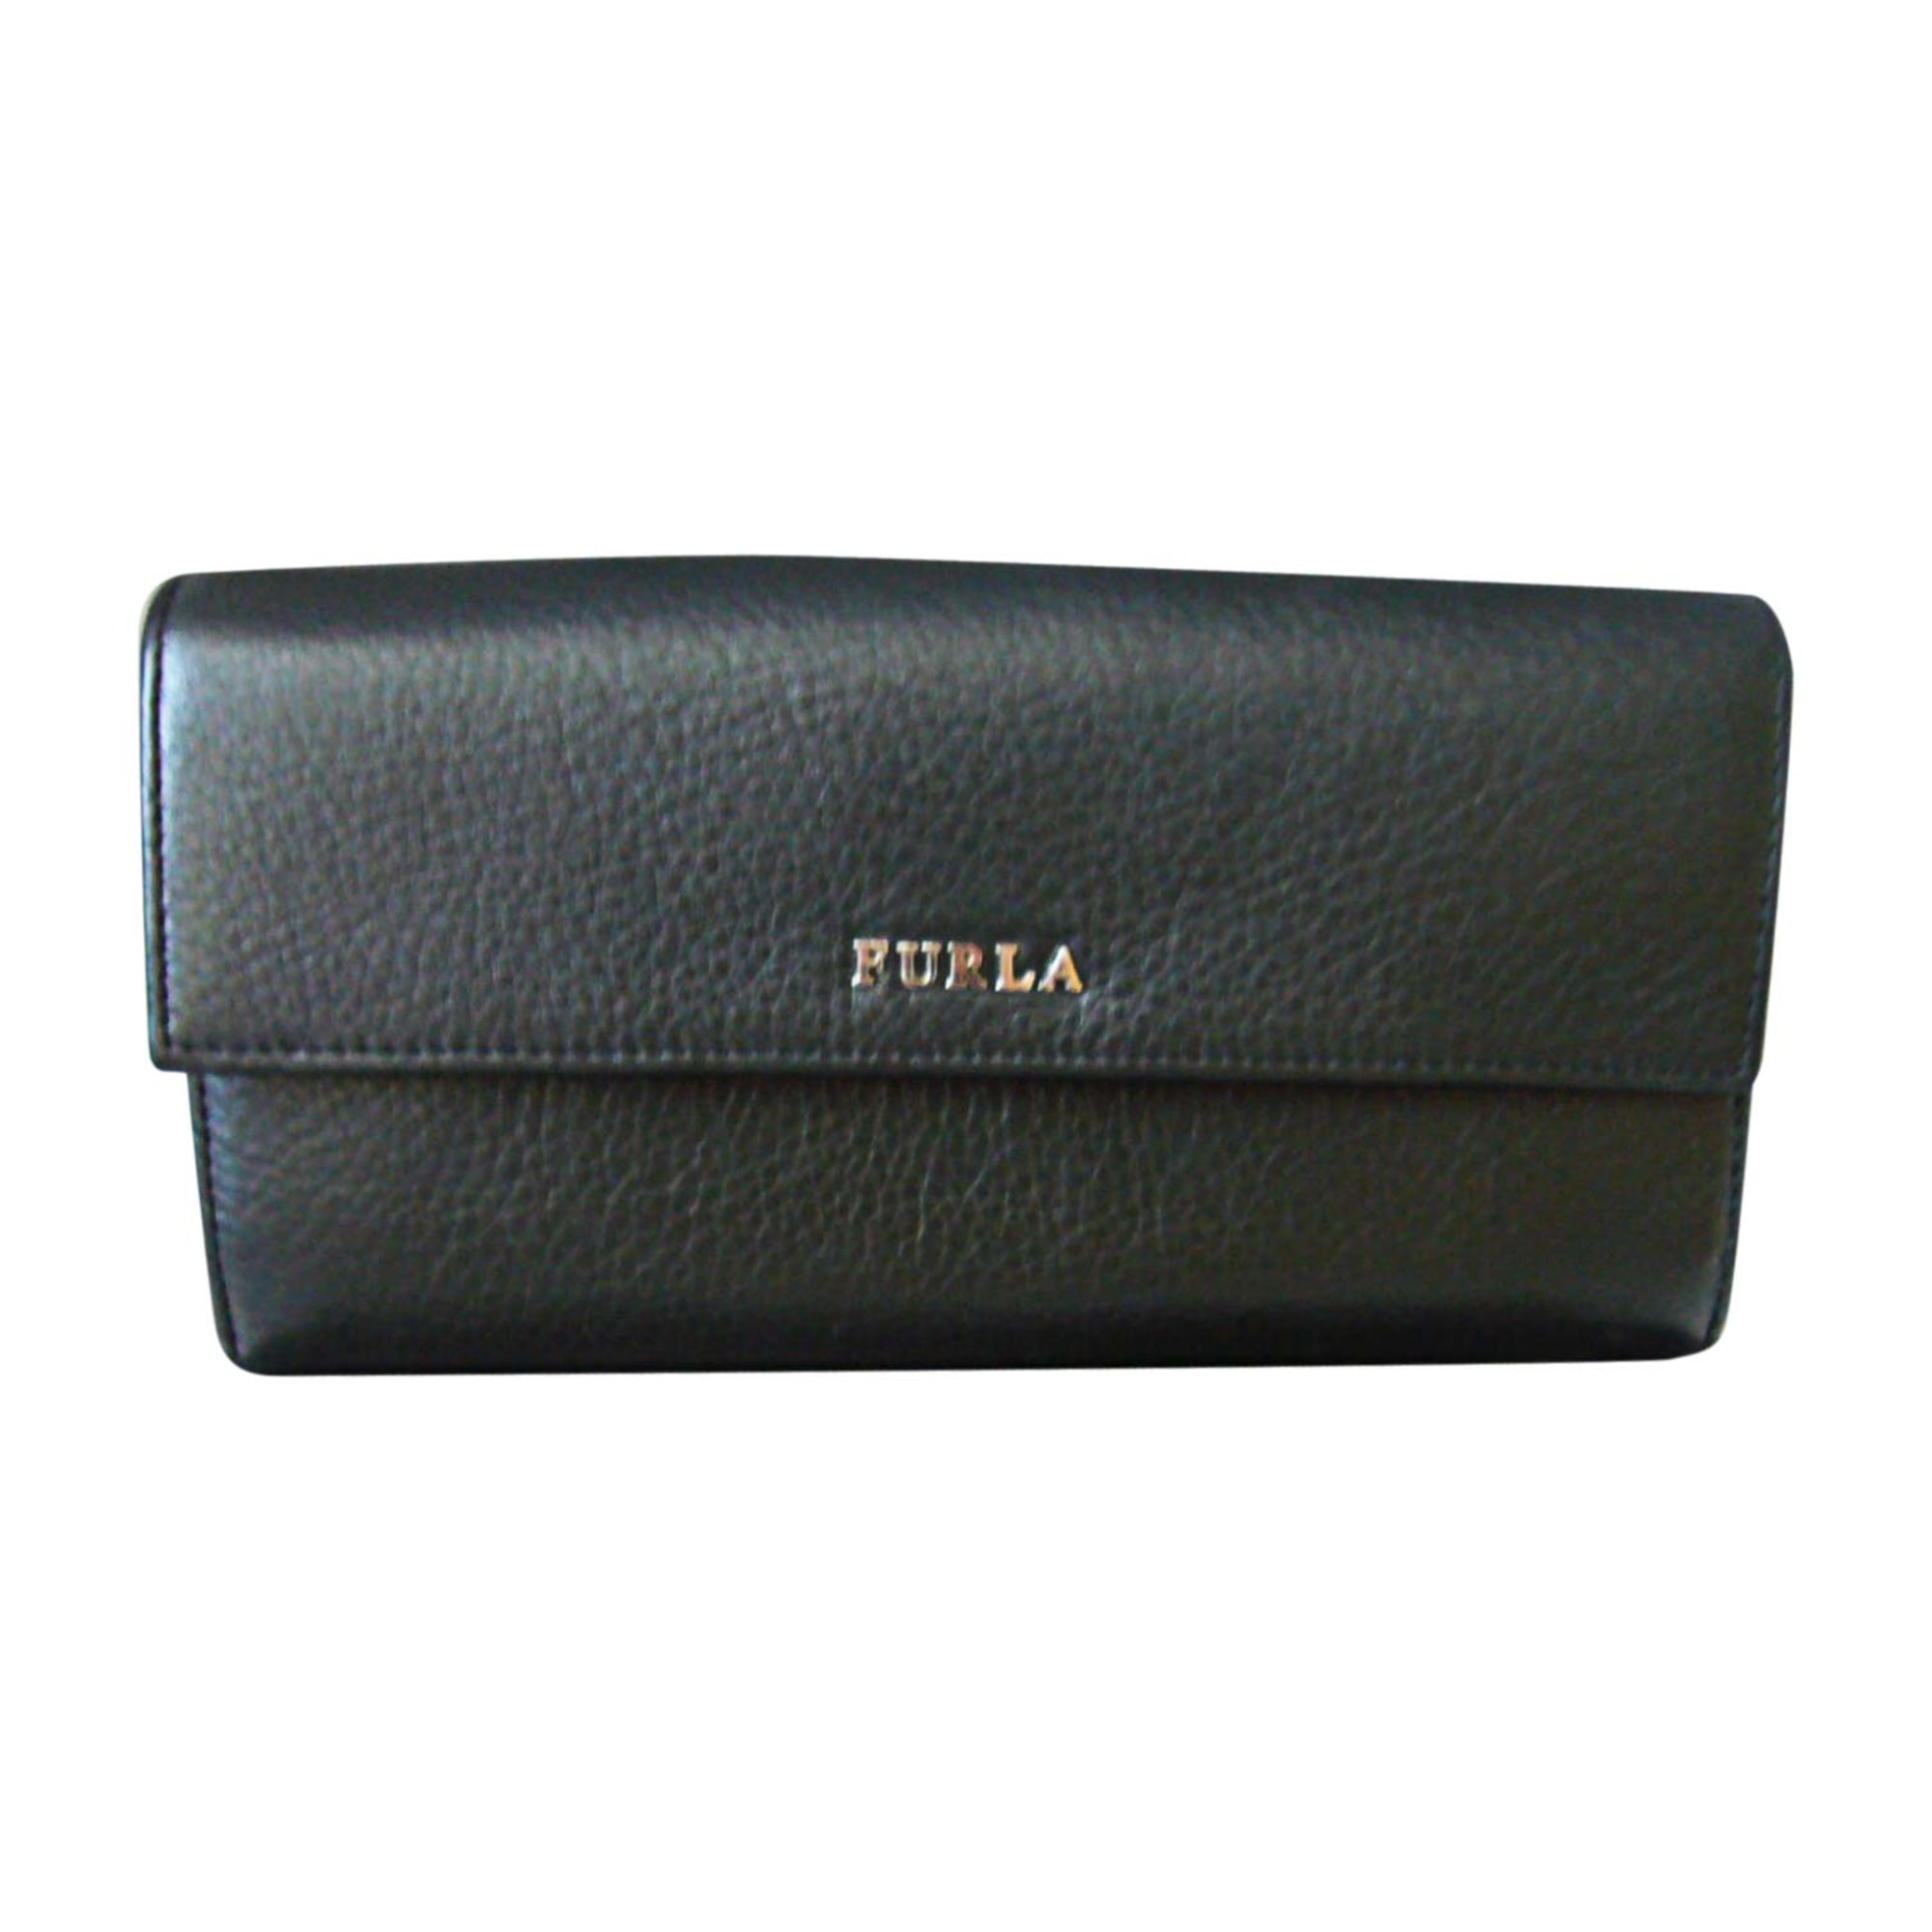 Portefeuille Furla Noir 8733717